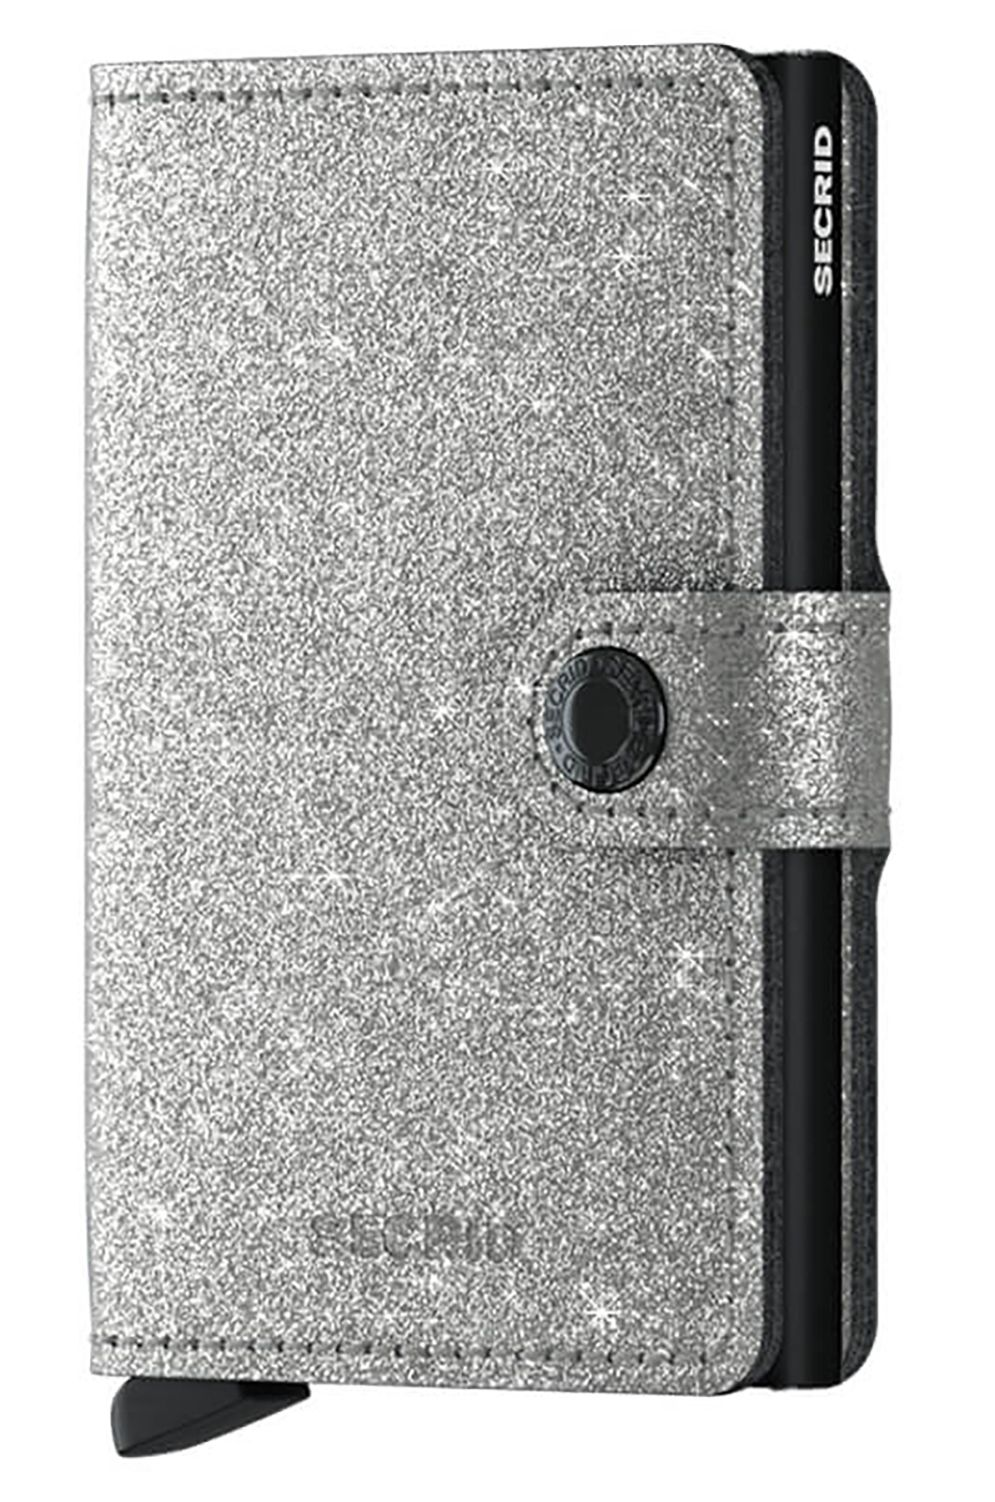 Secrid Leather Wallet MINIWALLET CRYSTALLINE Silver